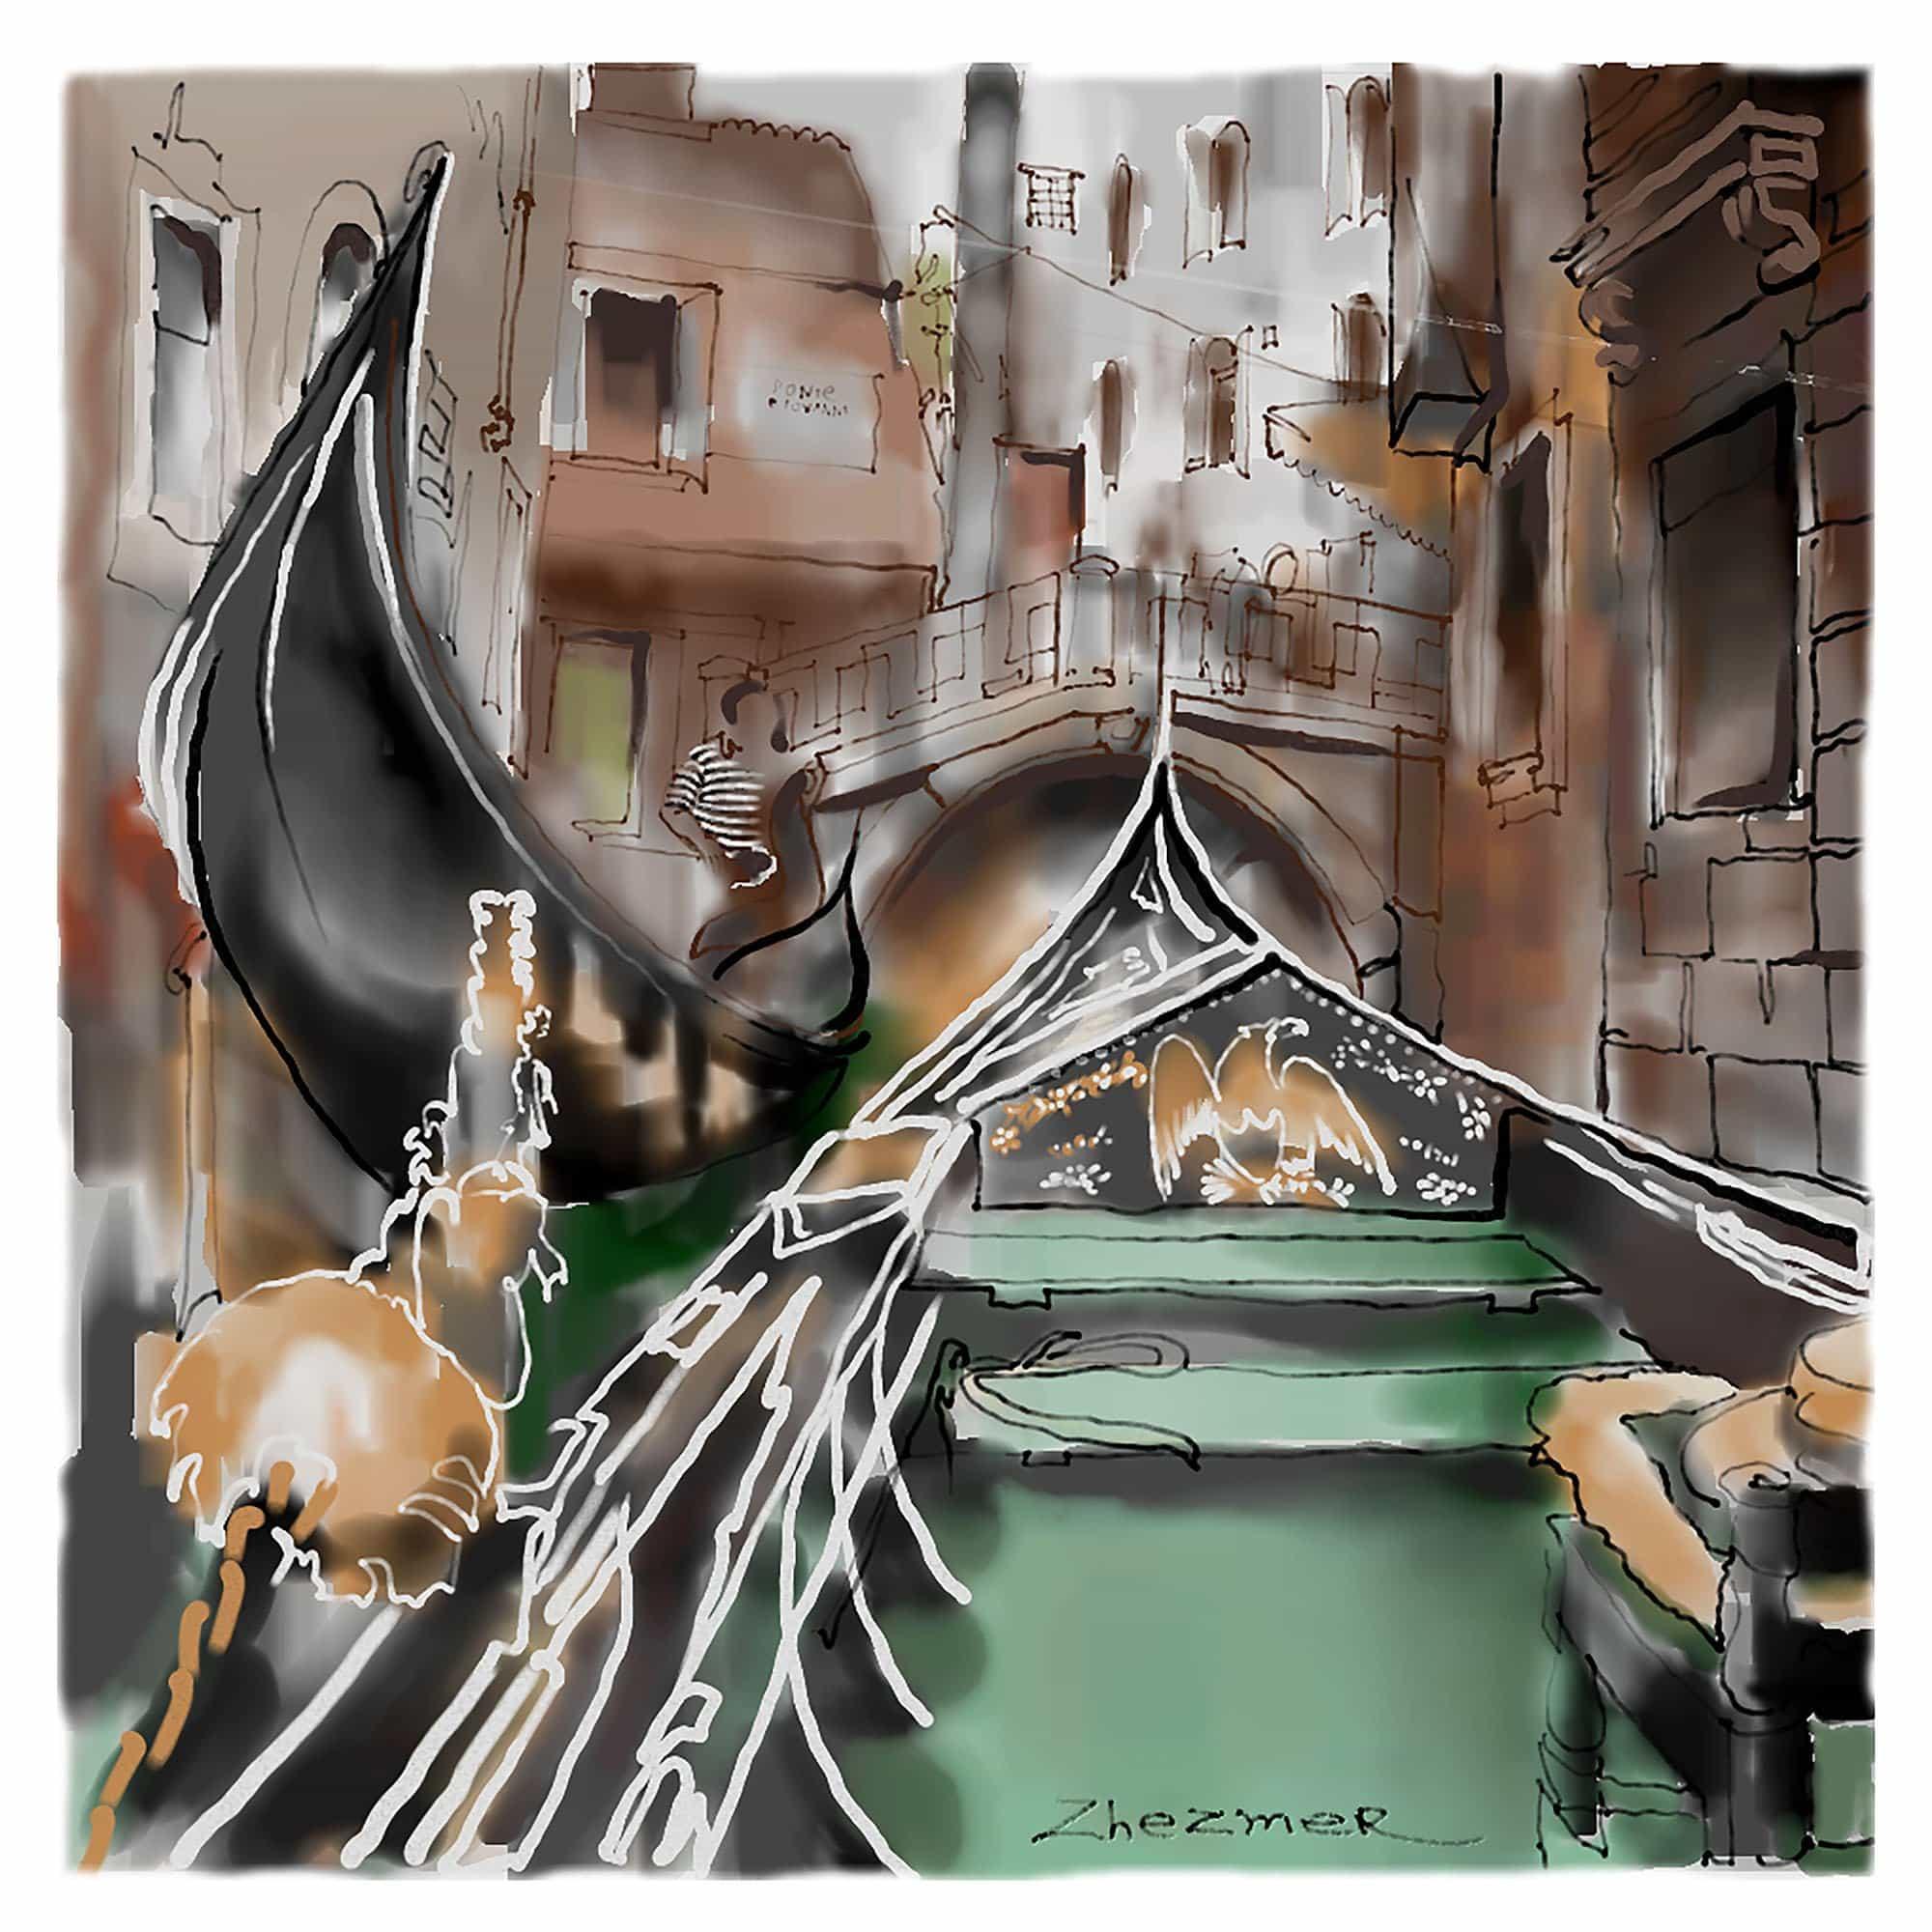 Venice Traffic - Tatiana Zhezmer